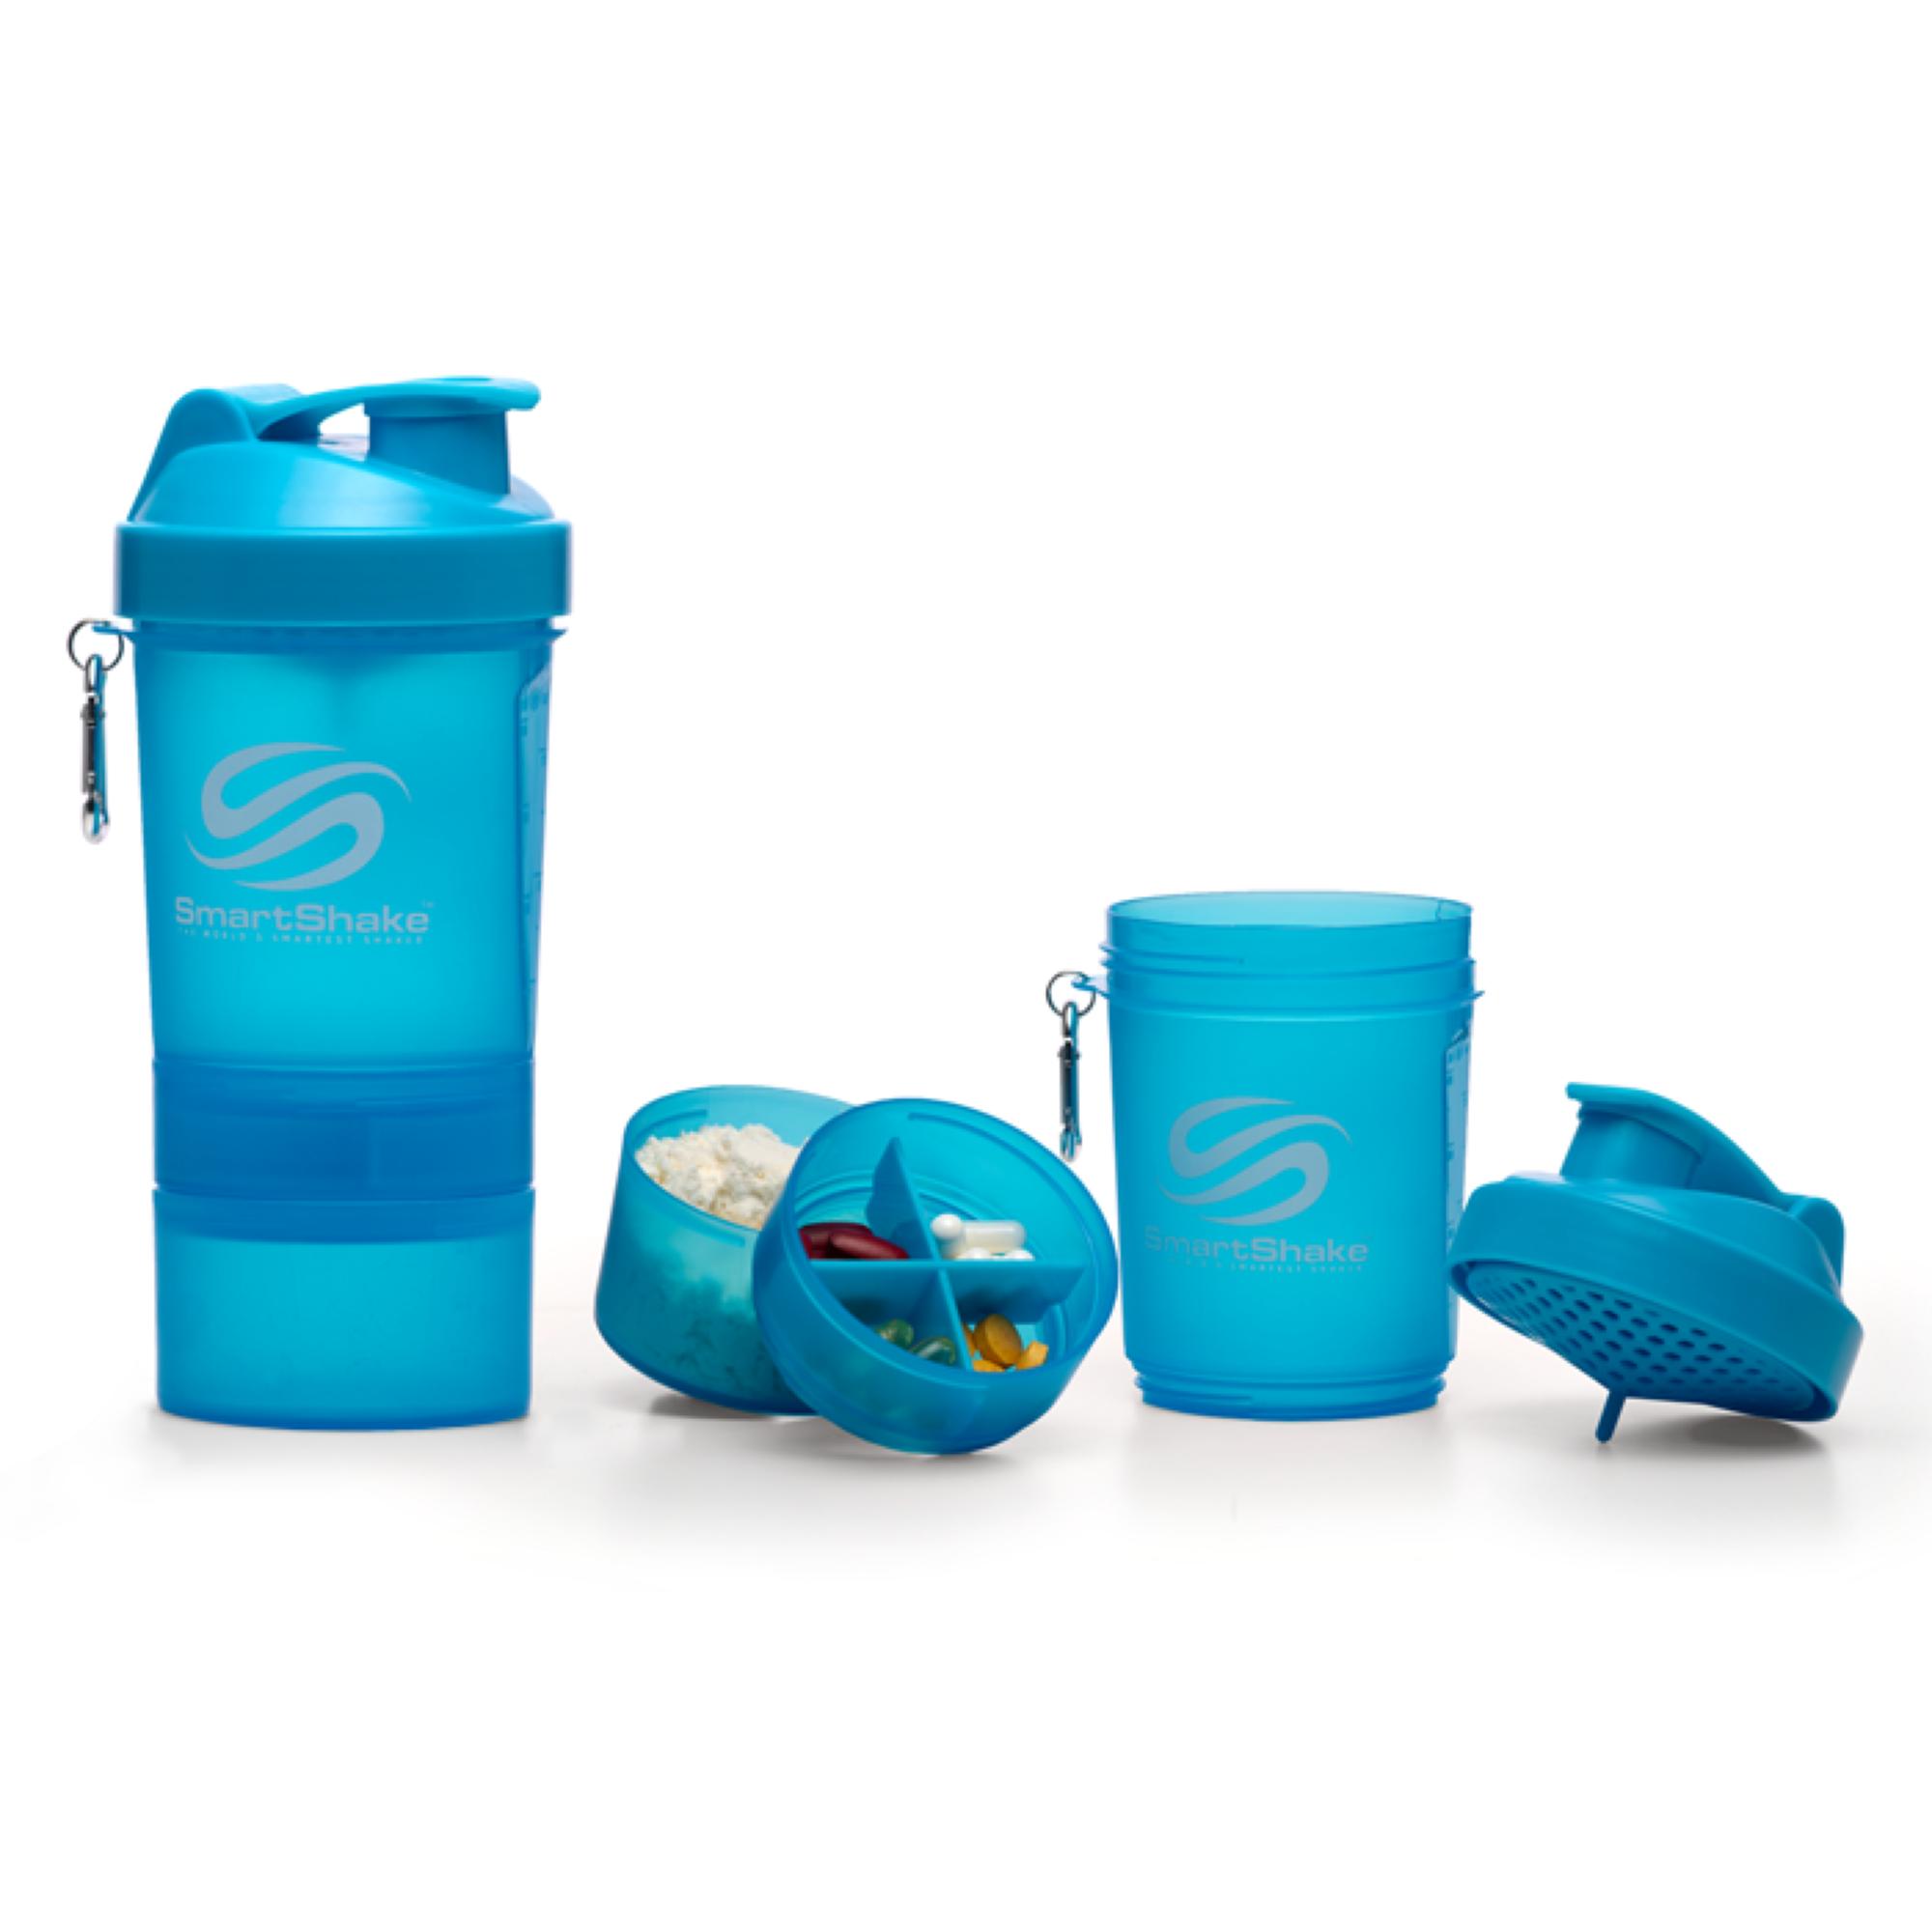 SmartShake Neon Series 600ml | Neon and Sports nutrition